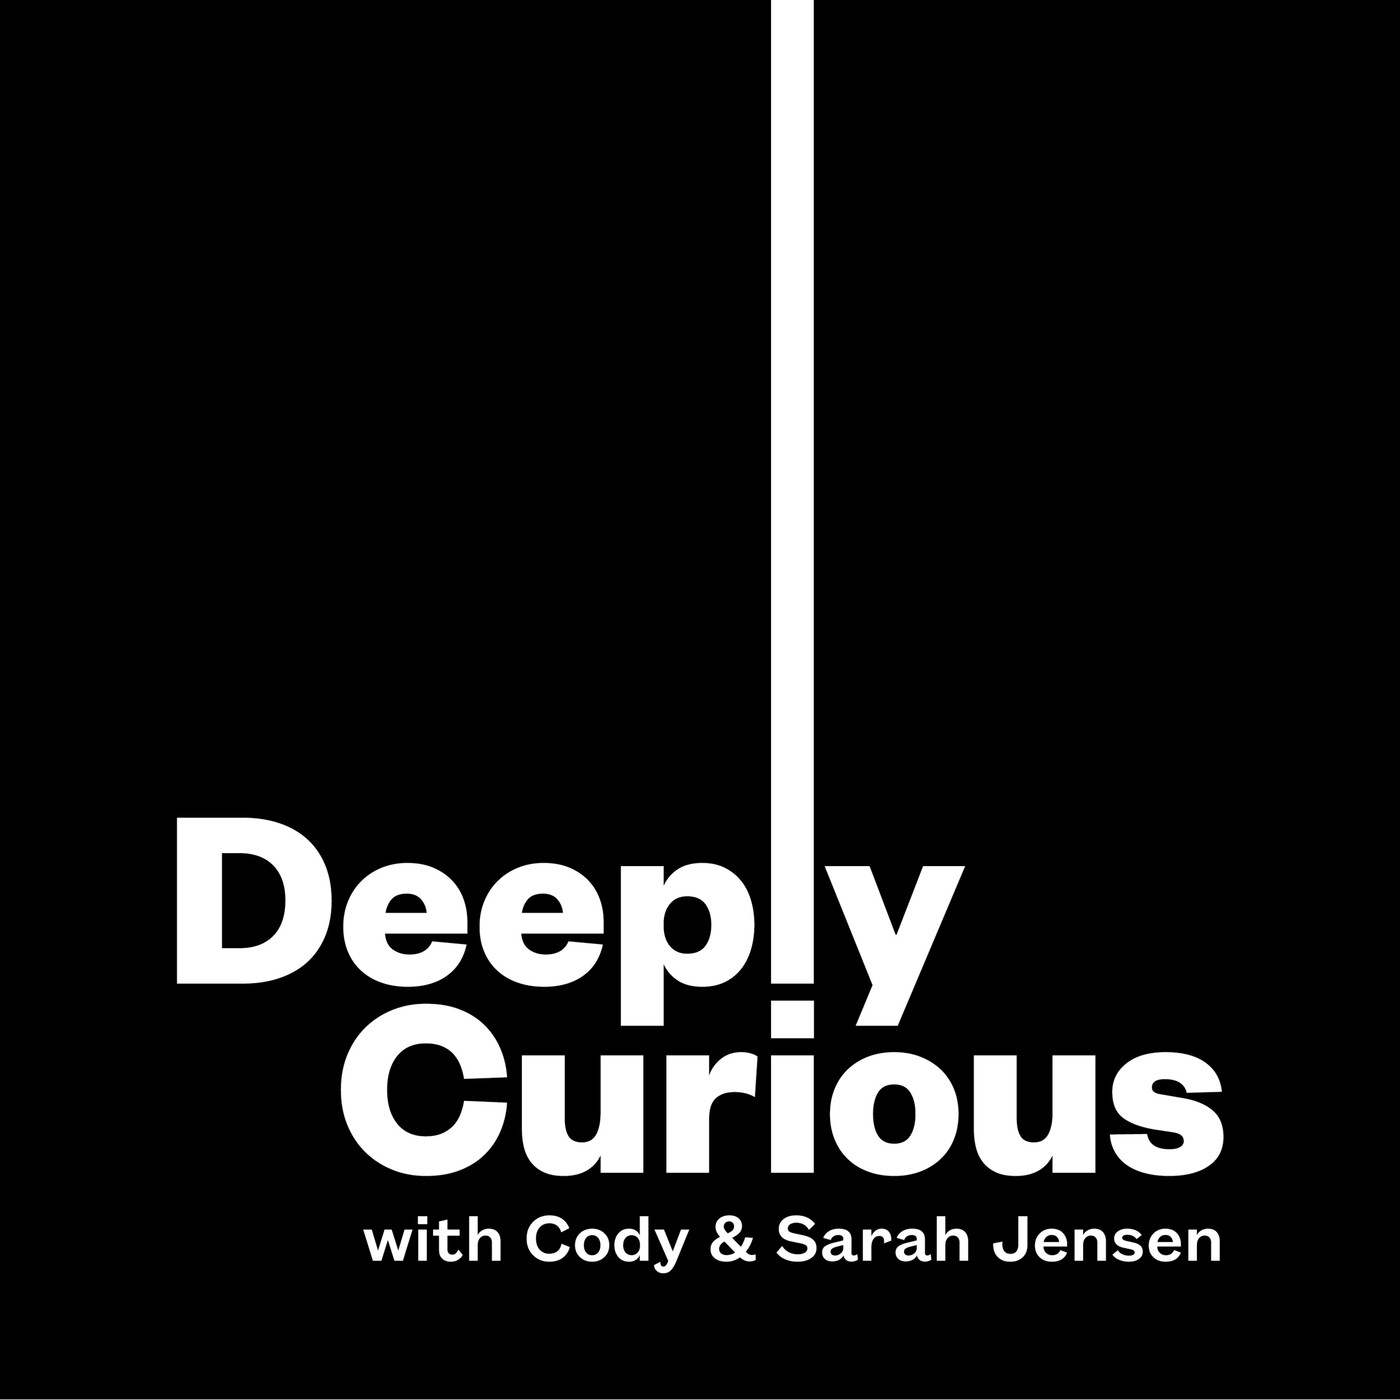 Deeply Curious